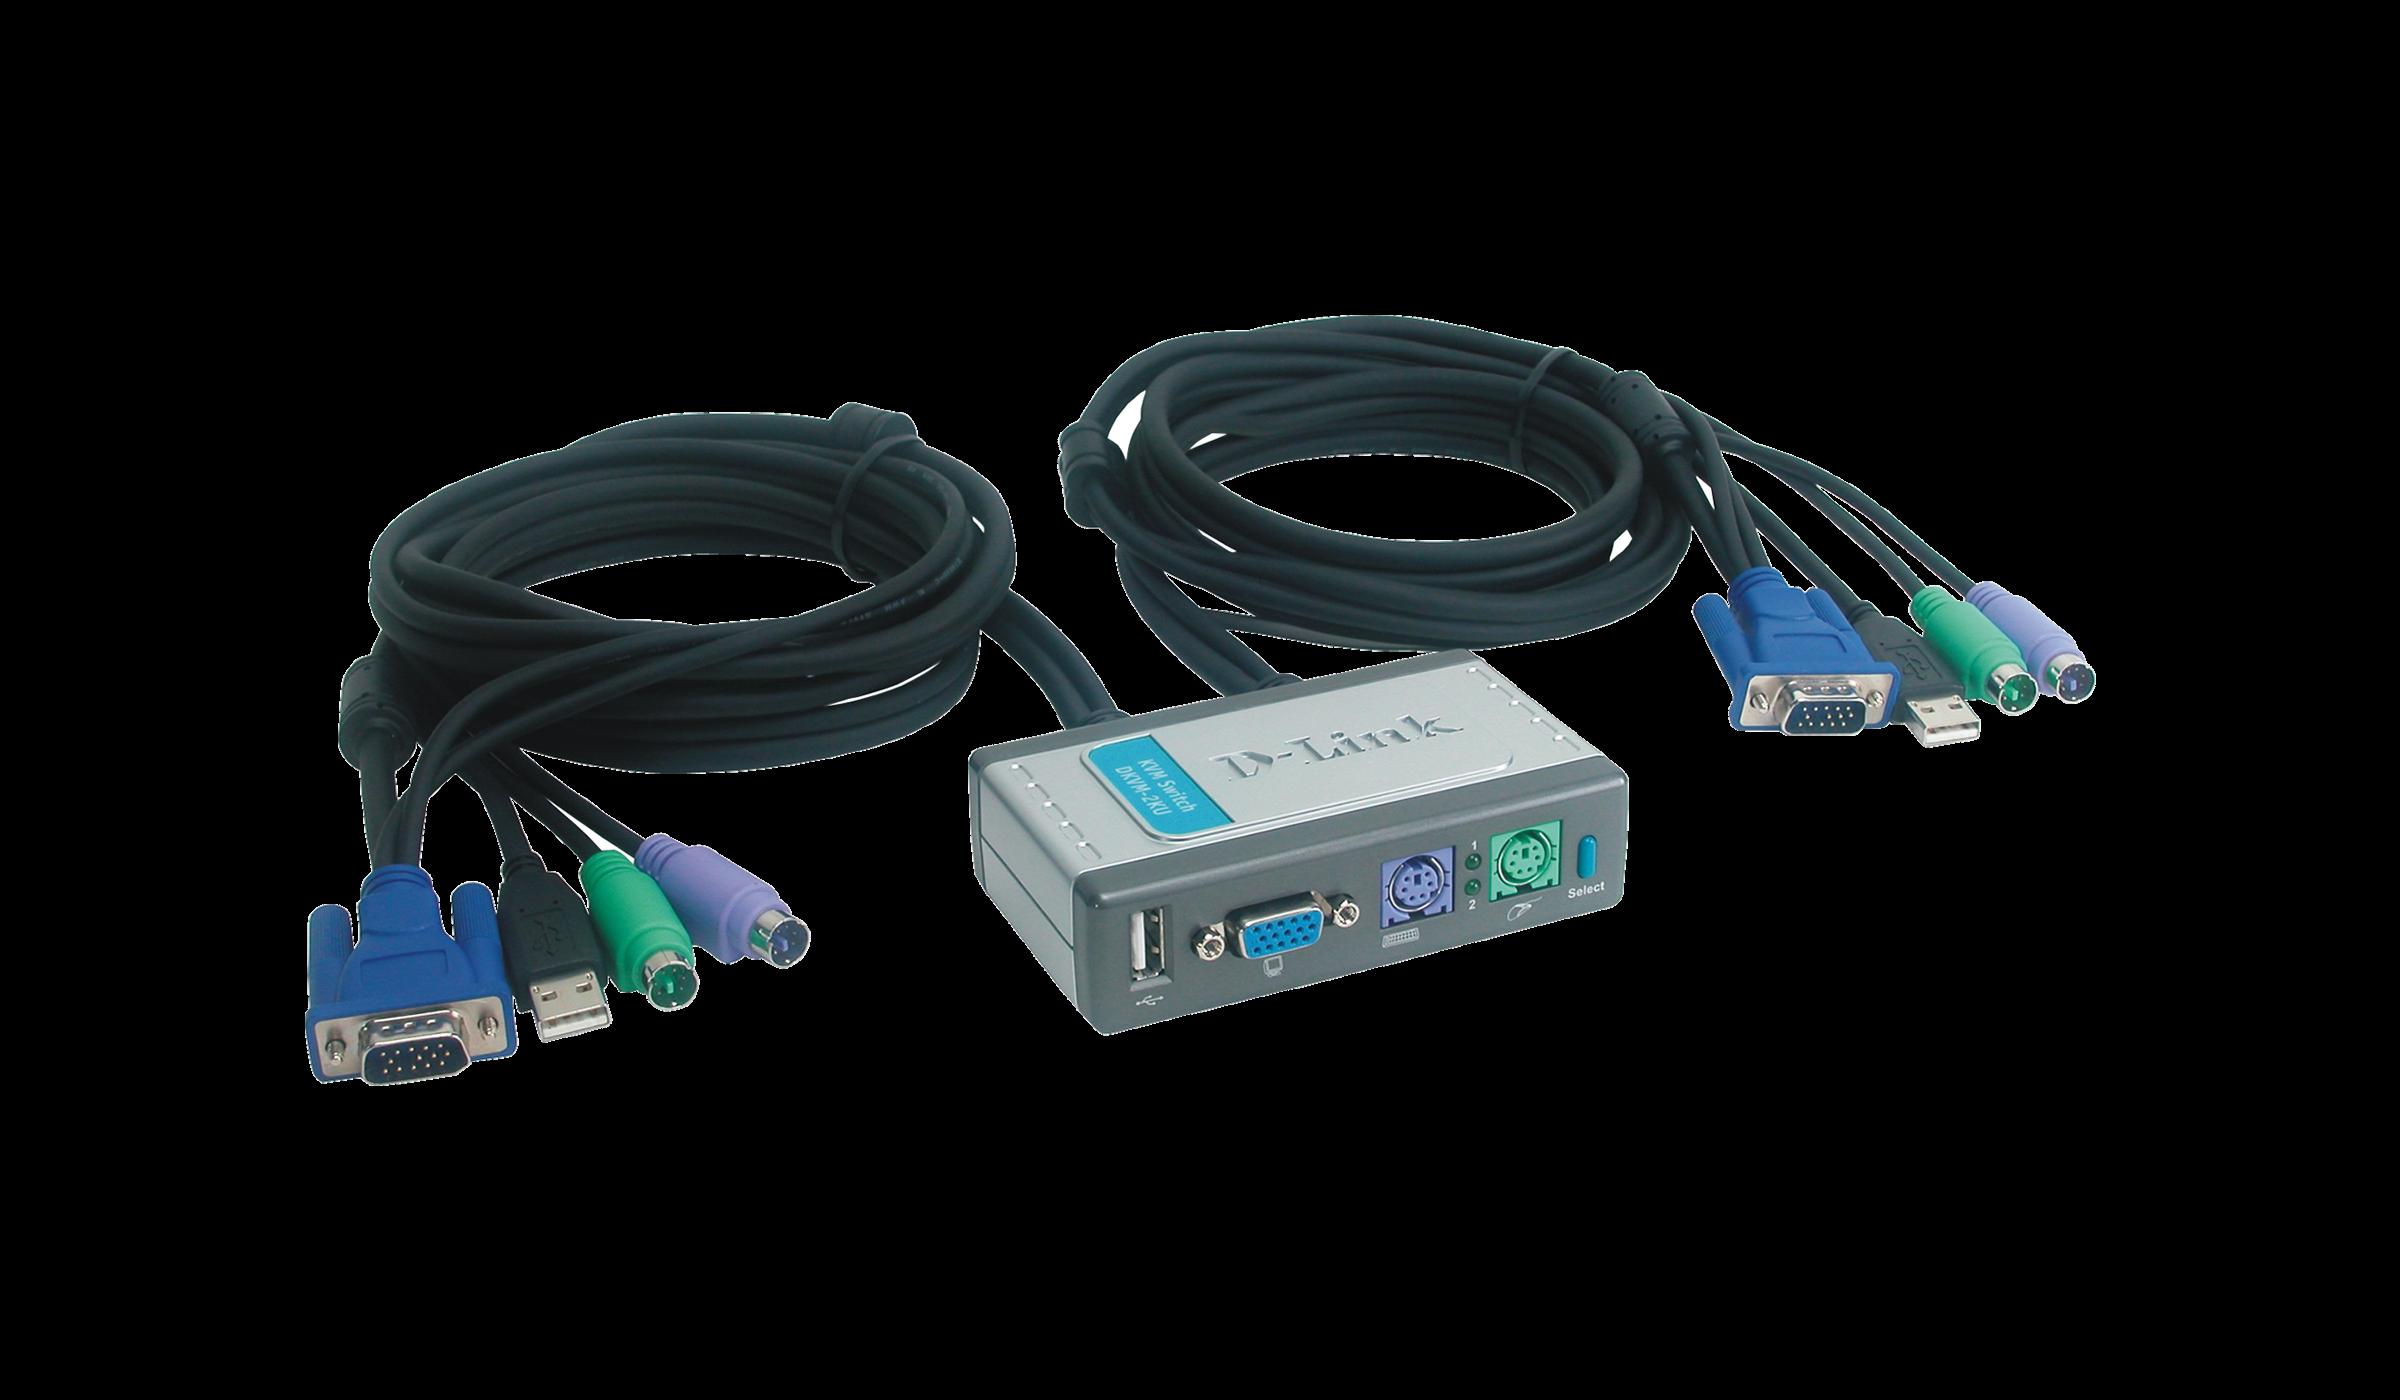 DKVM2KU 2Port KVM Switch with USB Port and Builtin Cables DLink UK